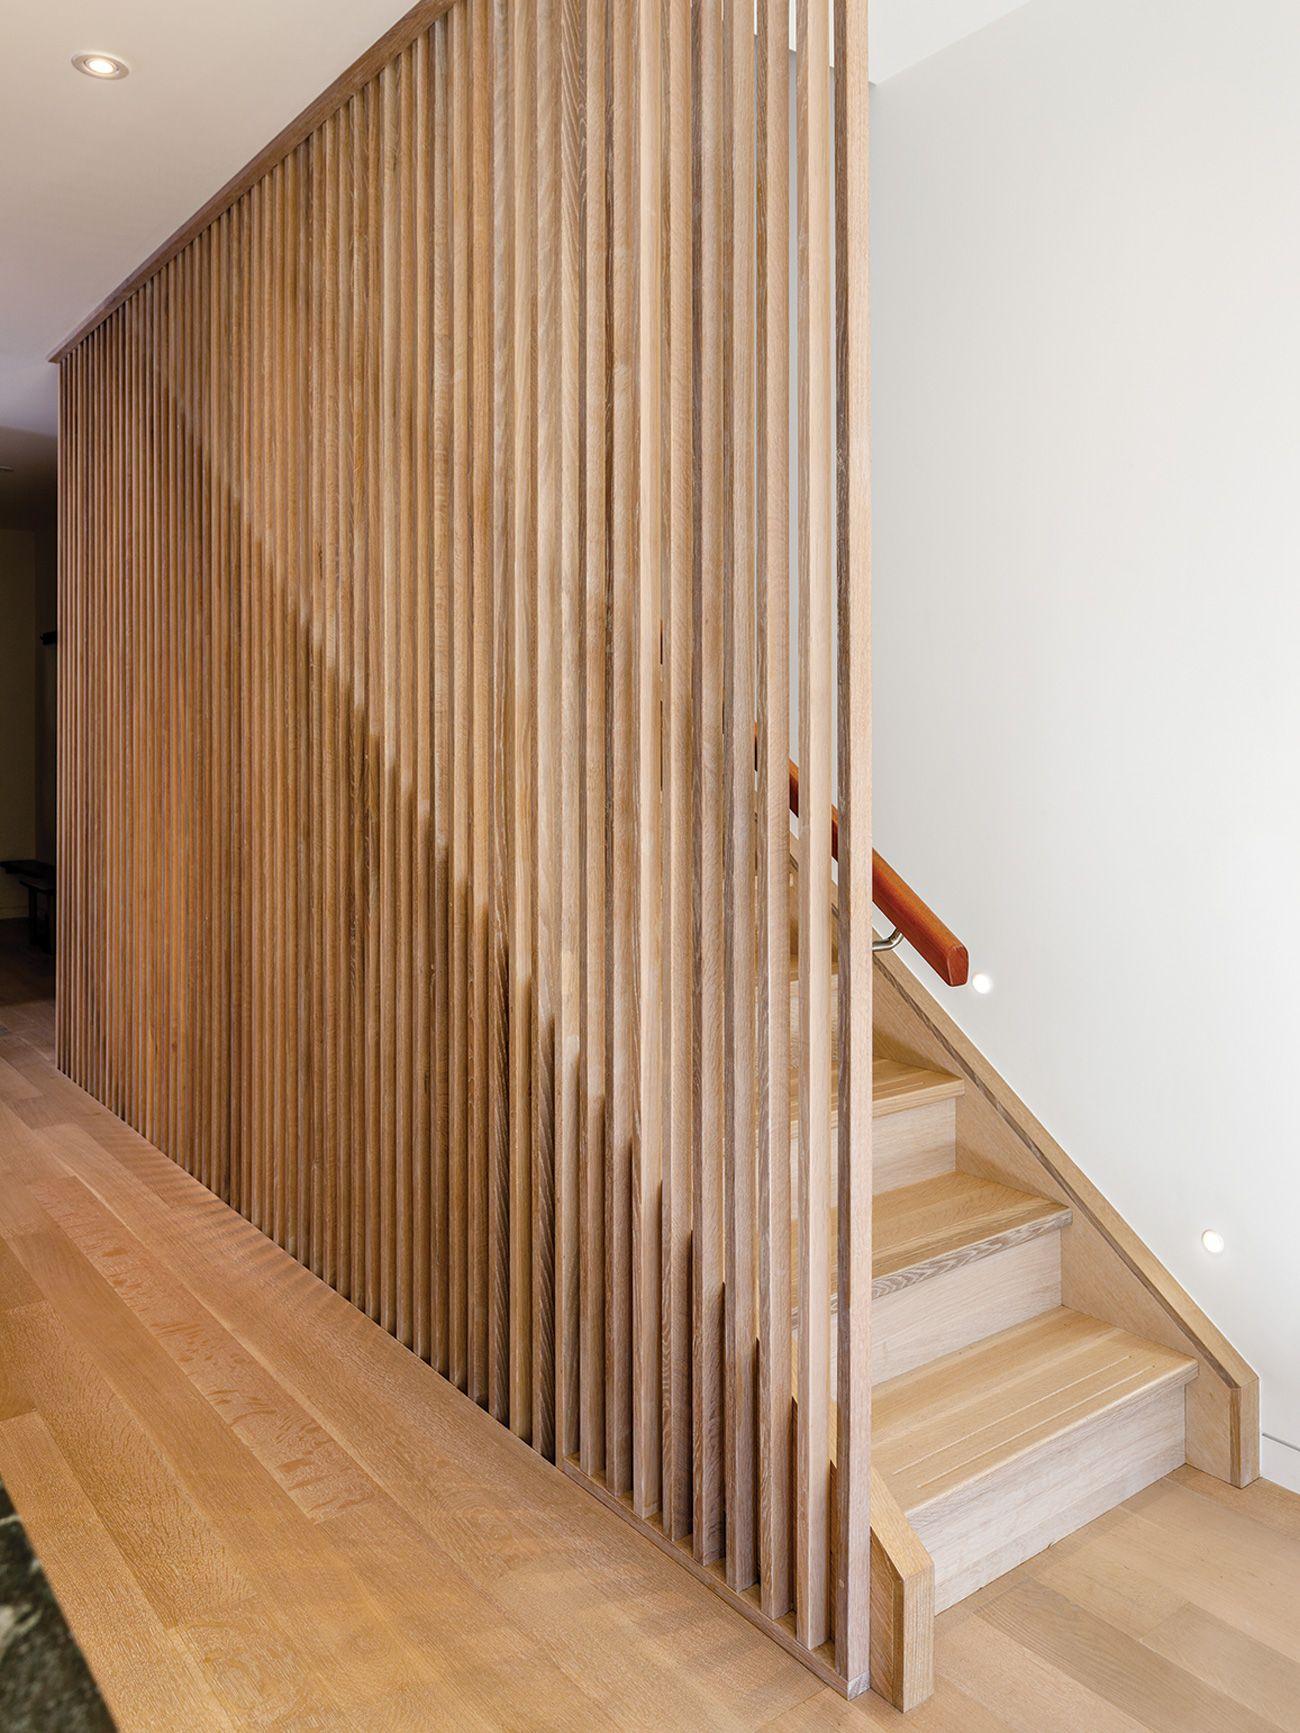 Best Slatted Wood Wood Slats Patio Design Modern Home Toronto 400 x 300